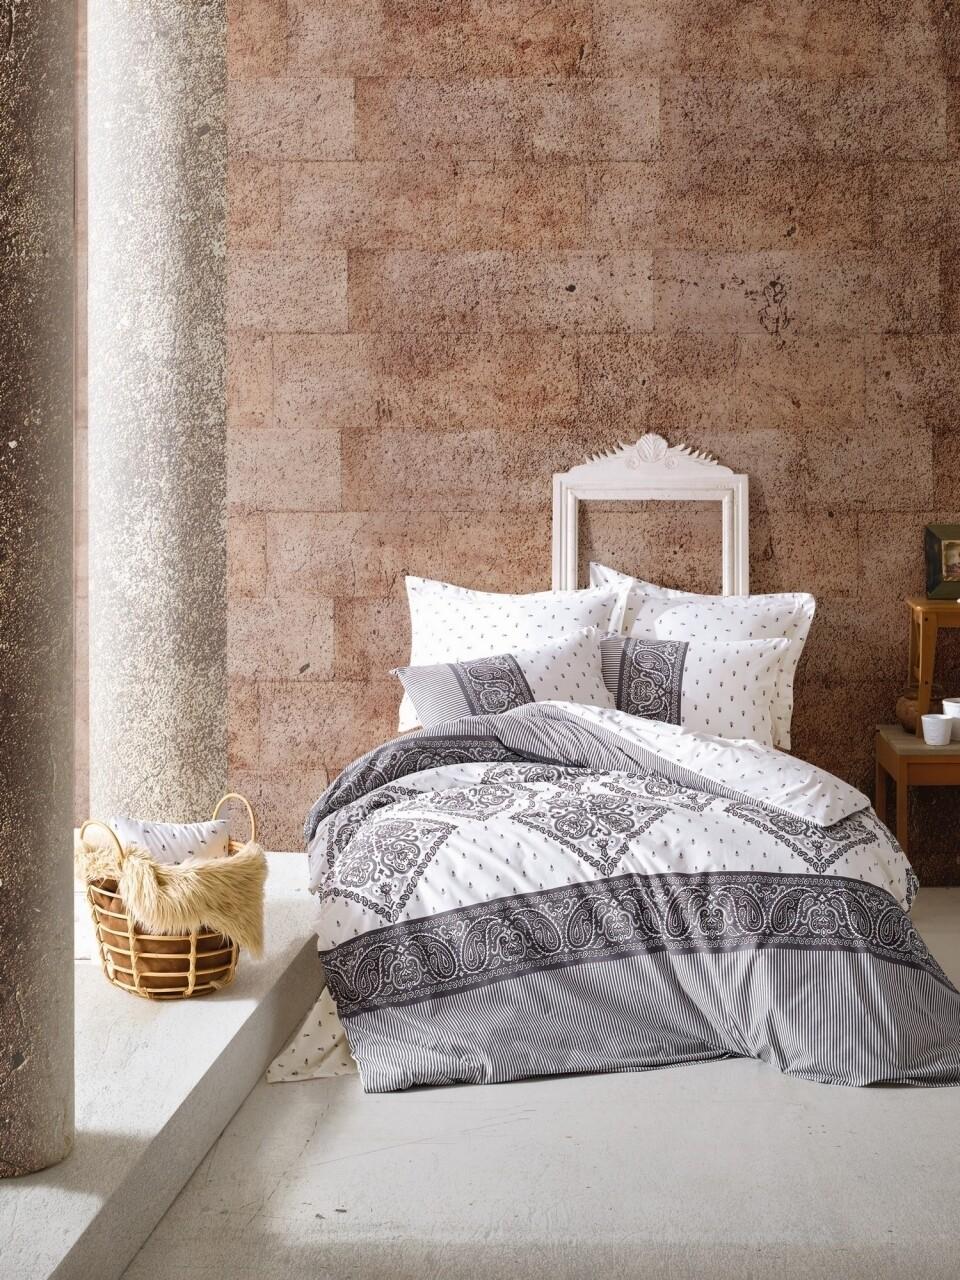 Lenjerie de pat pentru o persoana, 3 piese, 100% bumbac ranforce, Cotton Box, Alope